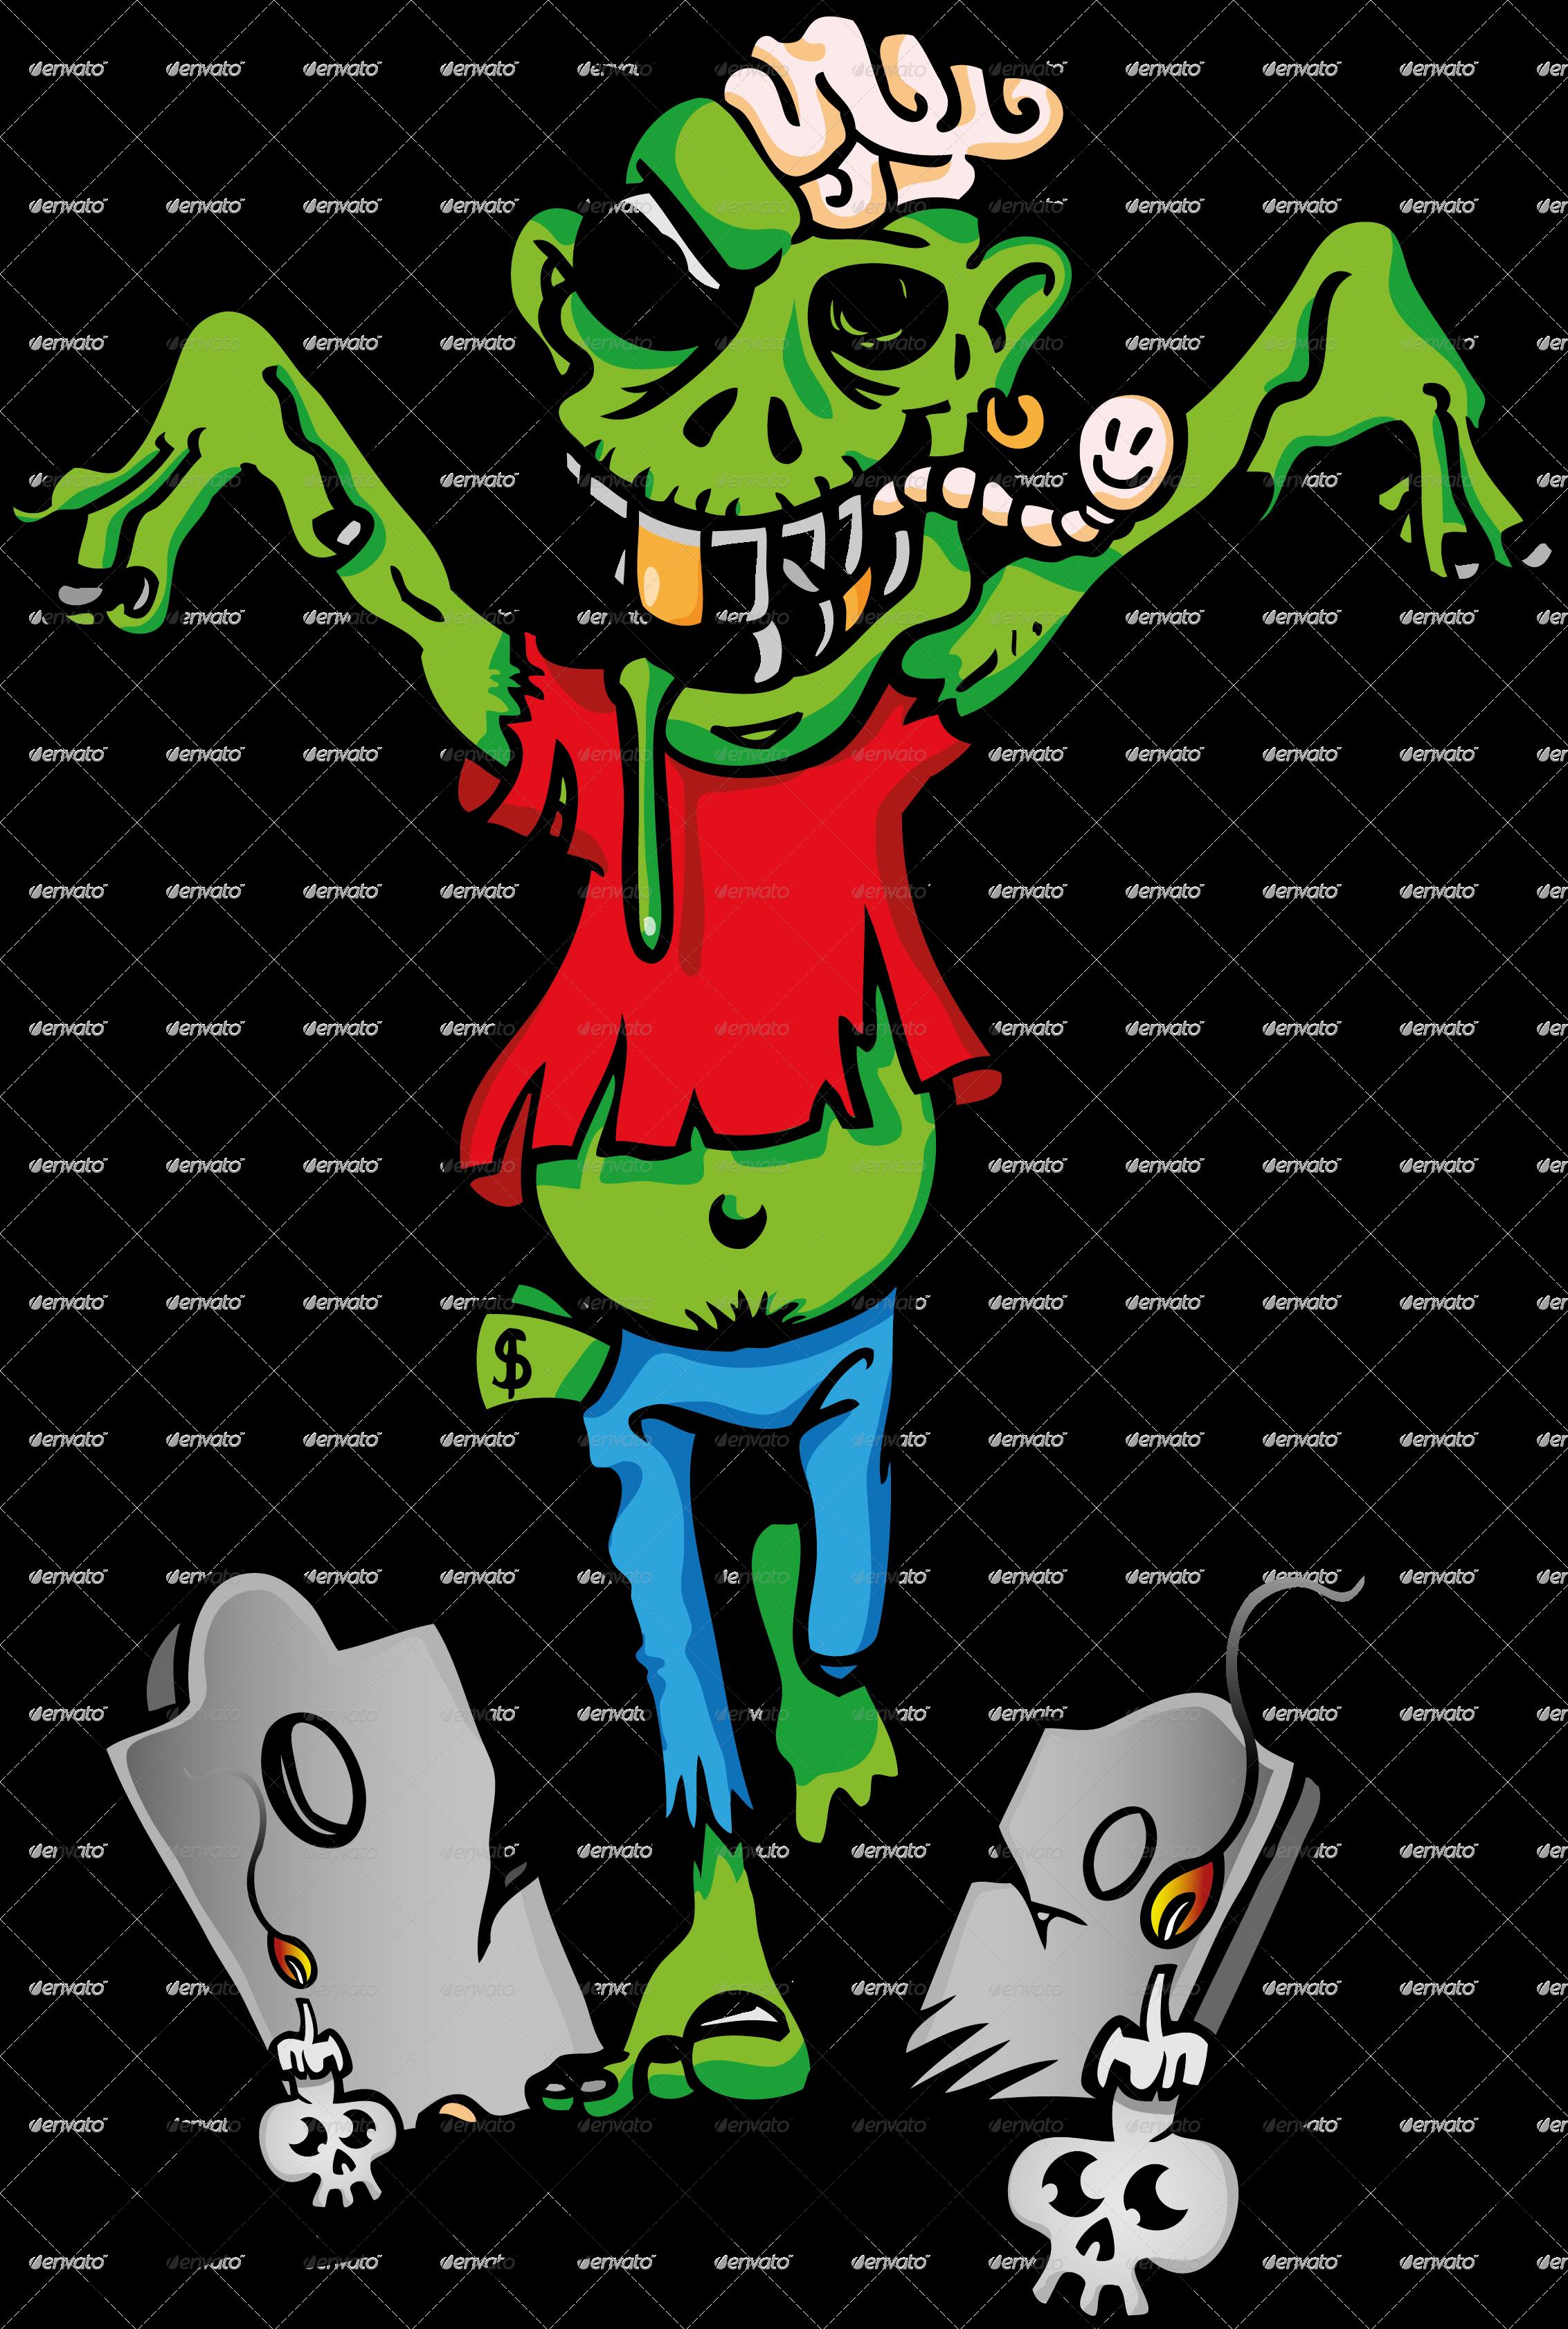 92 Foto Gambar Kartun Zombie Paling Keren